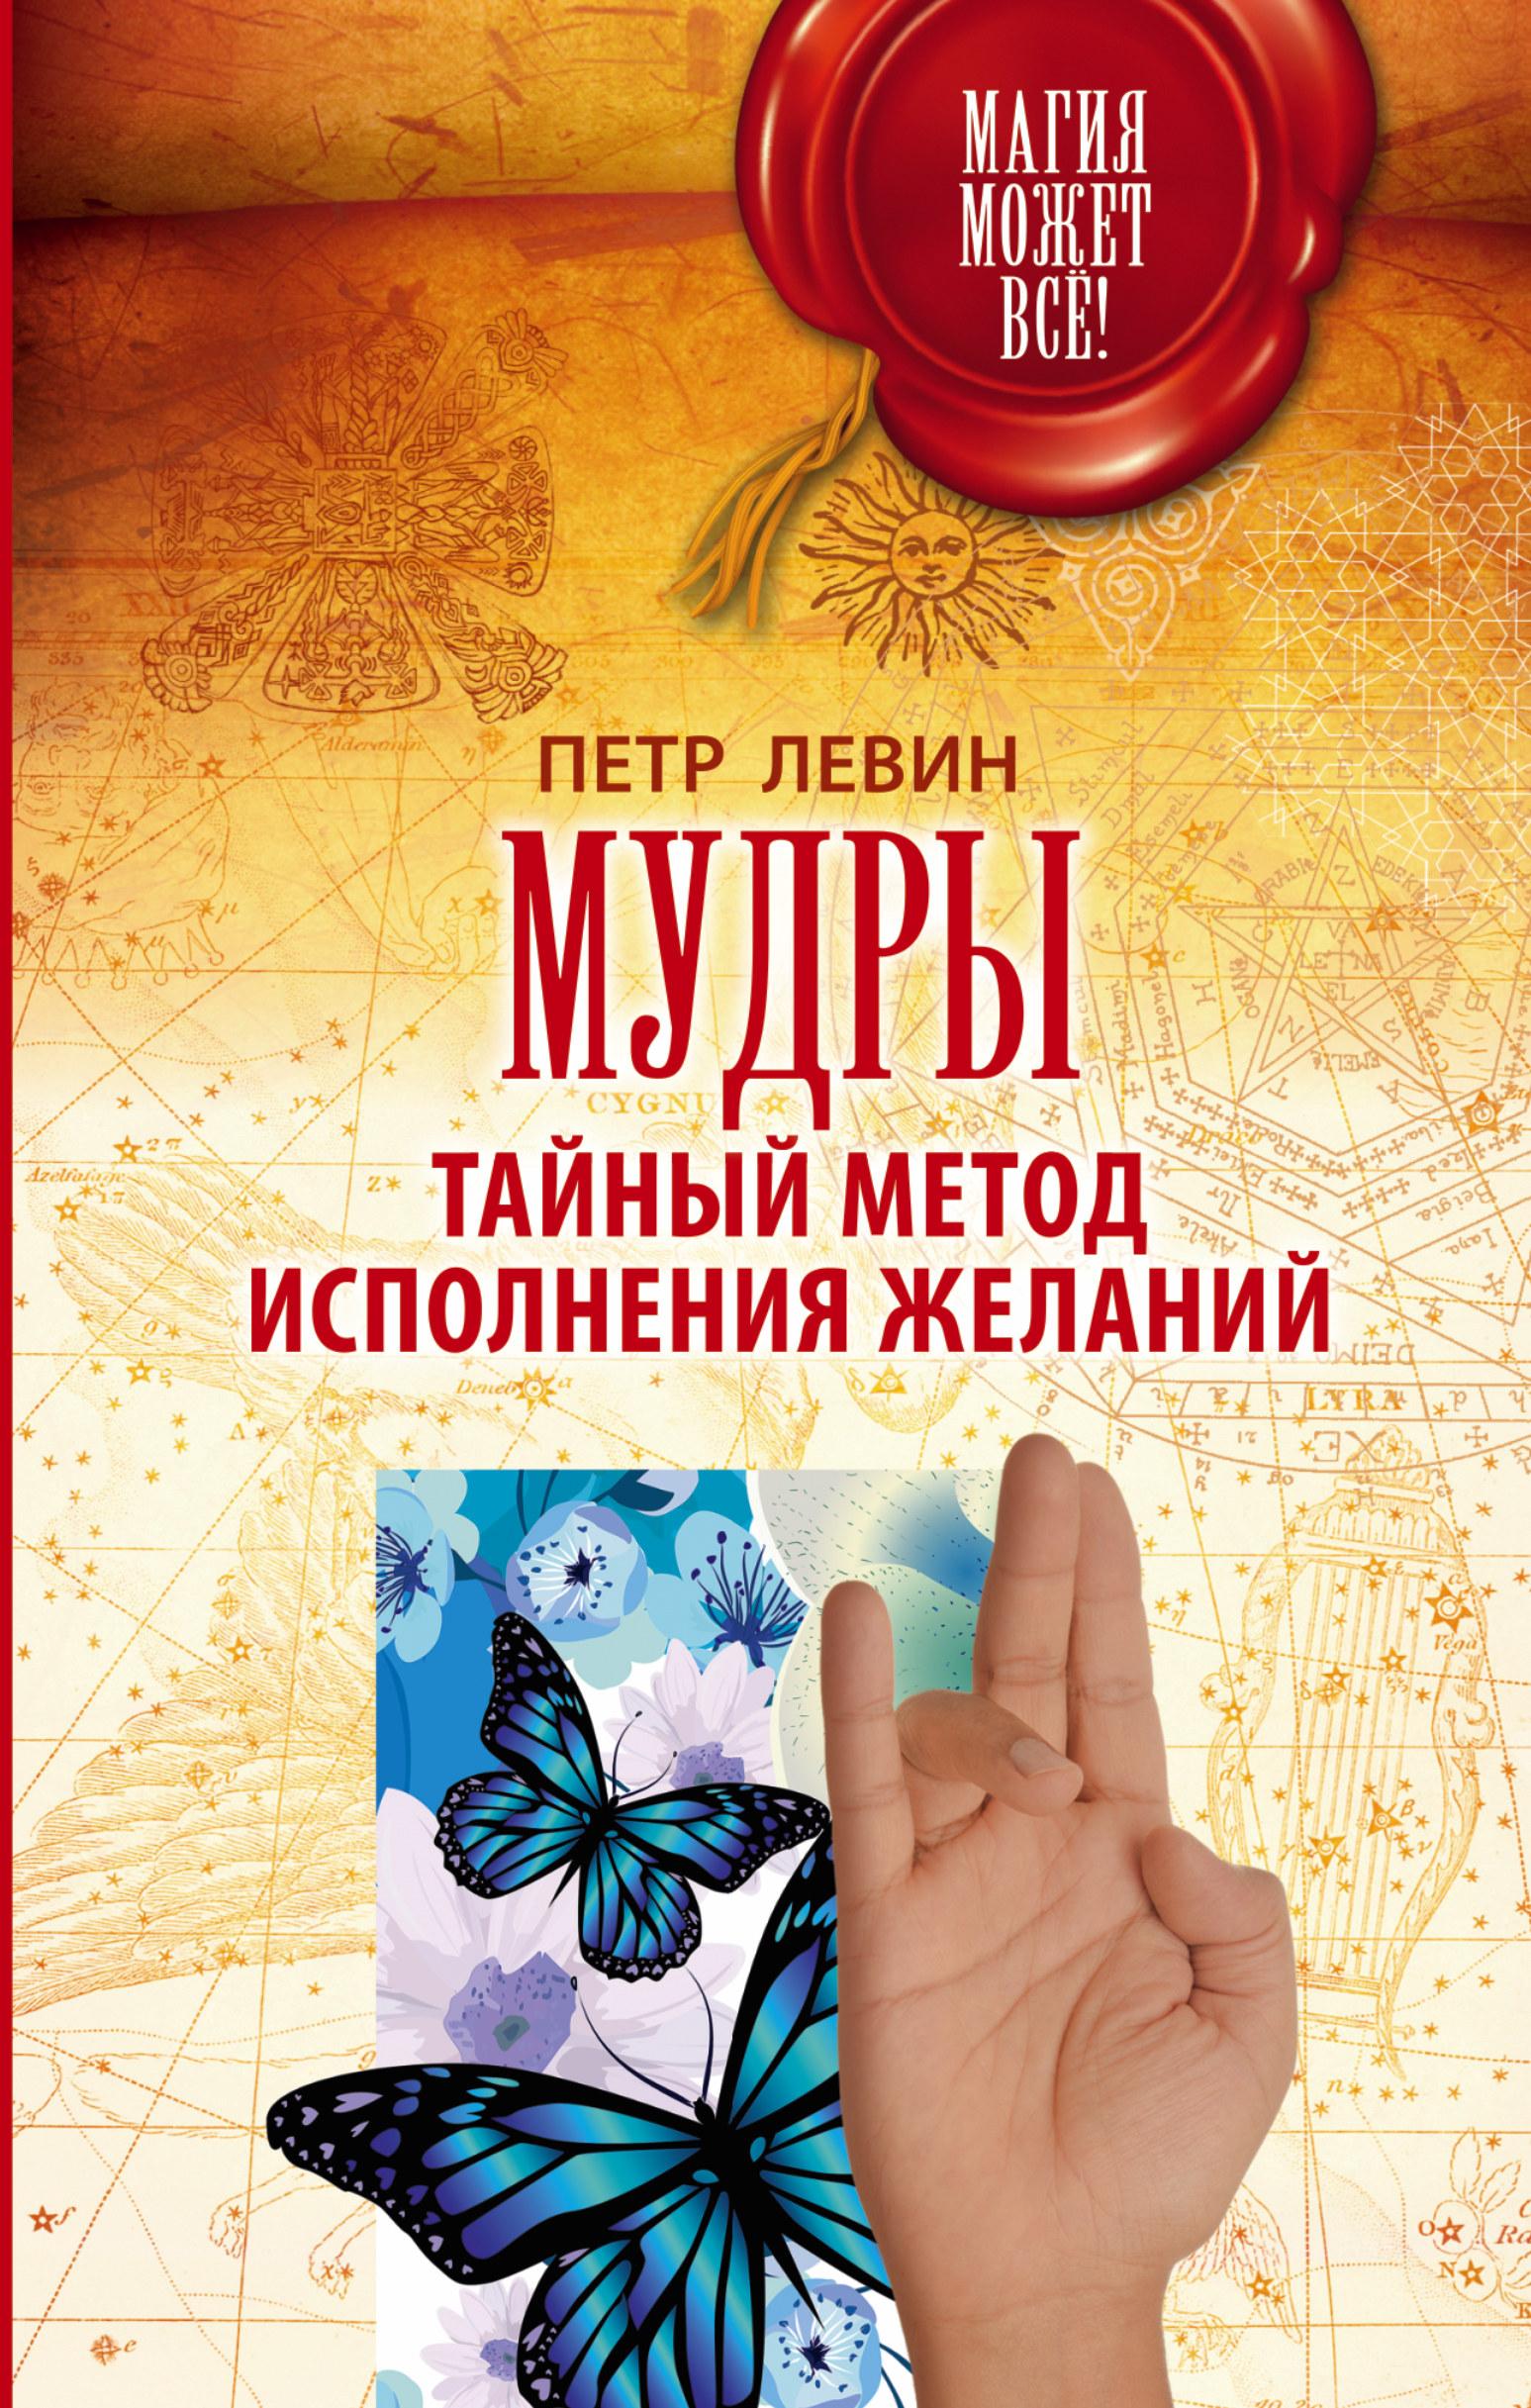 Левин Петр Мудры: Тайный метод исполнения желаний